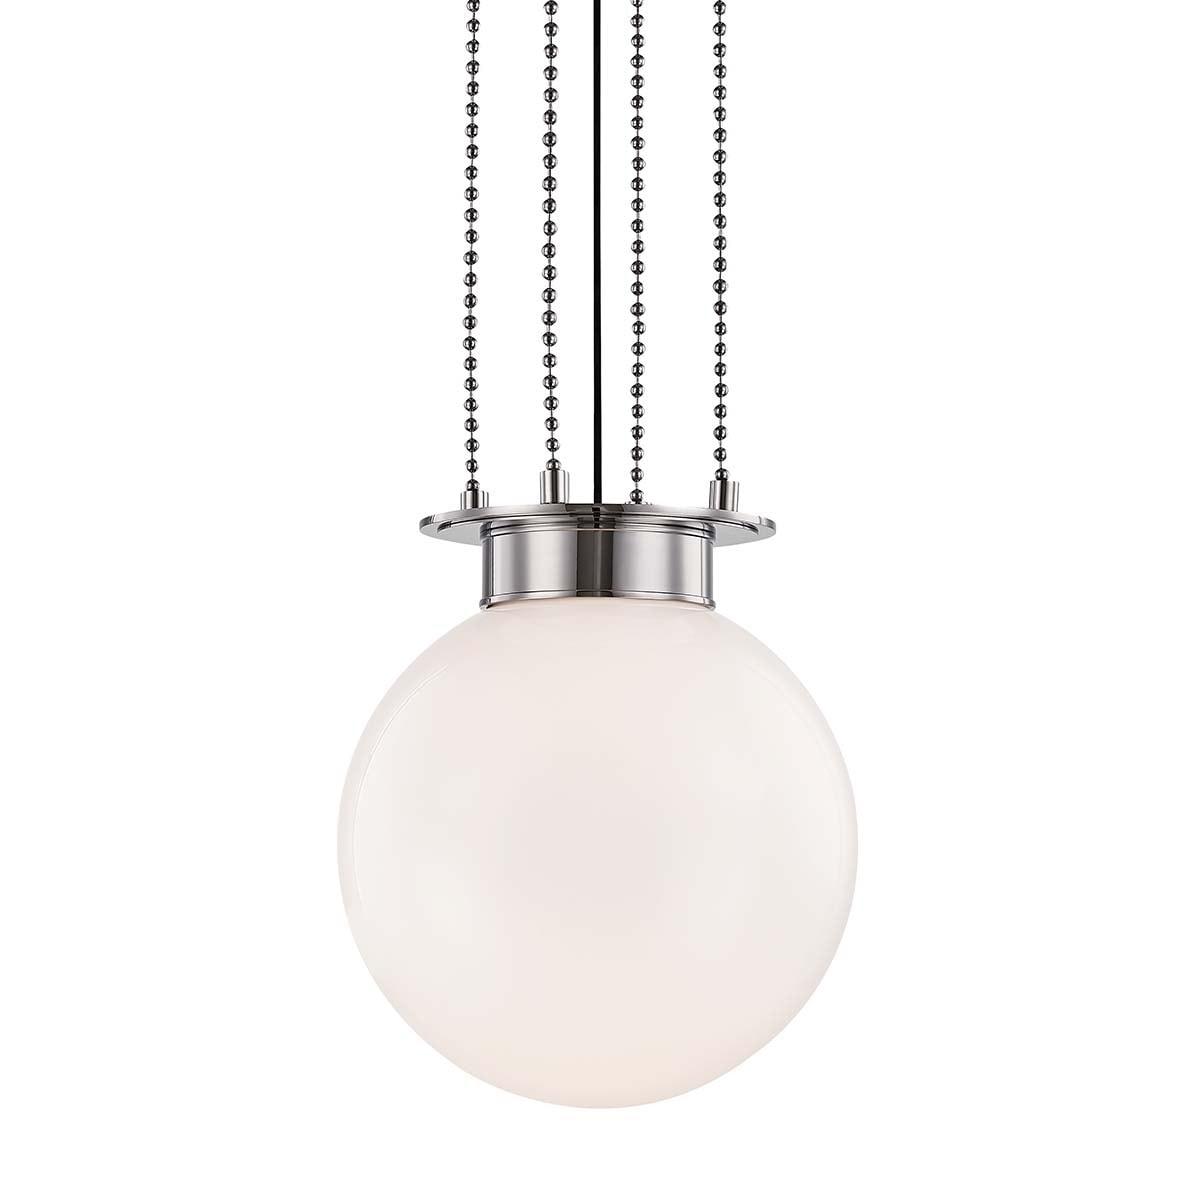 Hudson Valley Gunther 1-light Polished Nickel Medium Pendant, White Glass